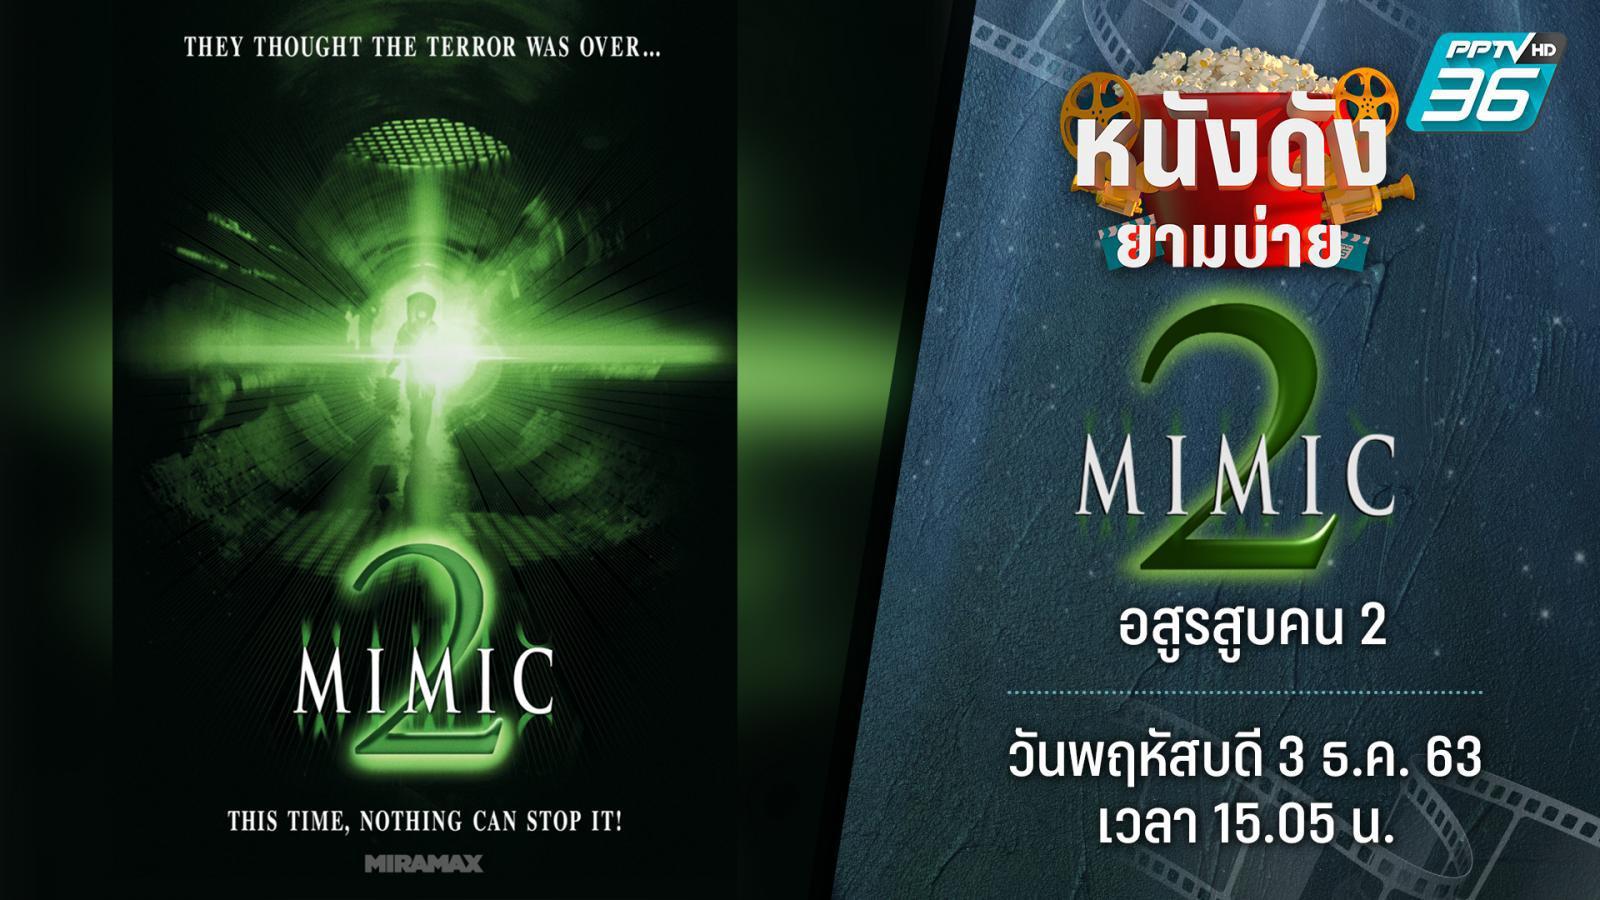 Mimic 2 อสูรสูบคน 2